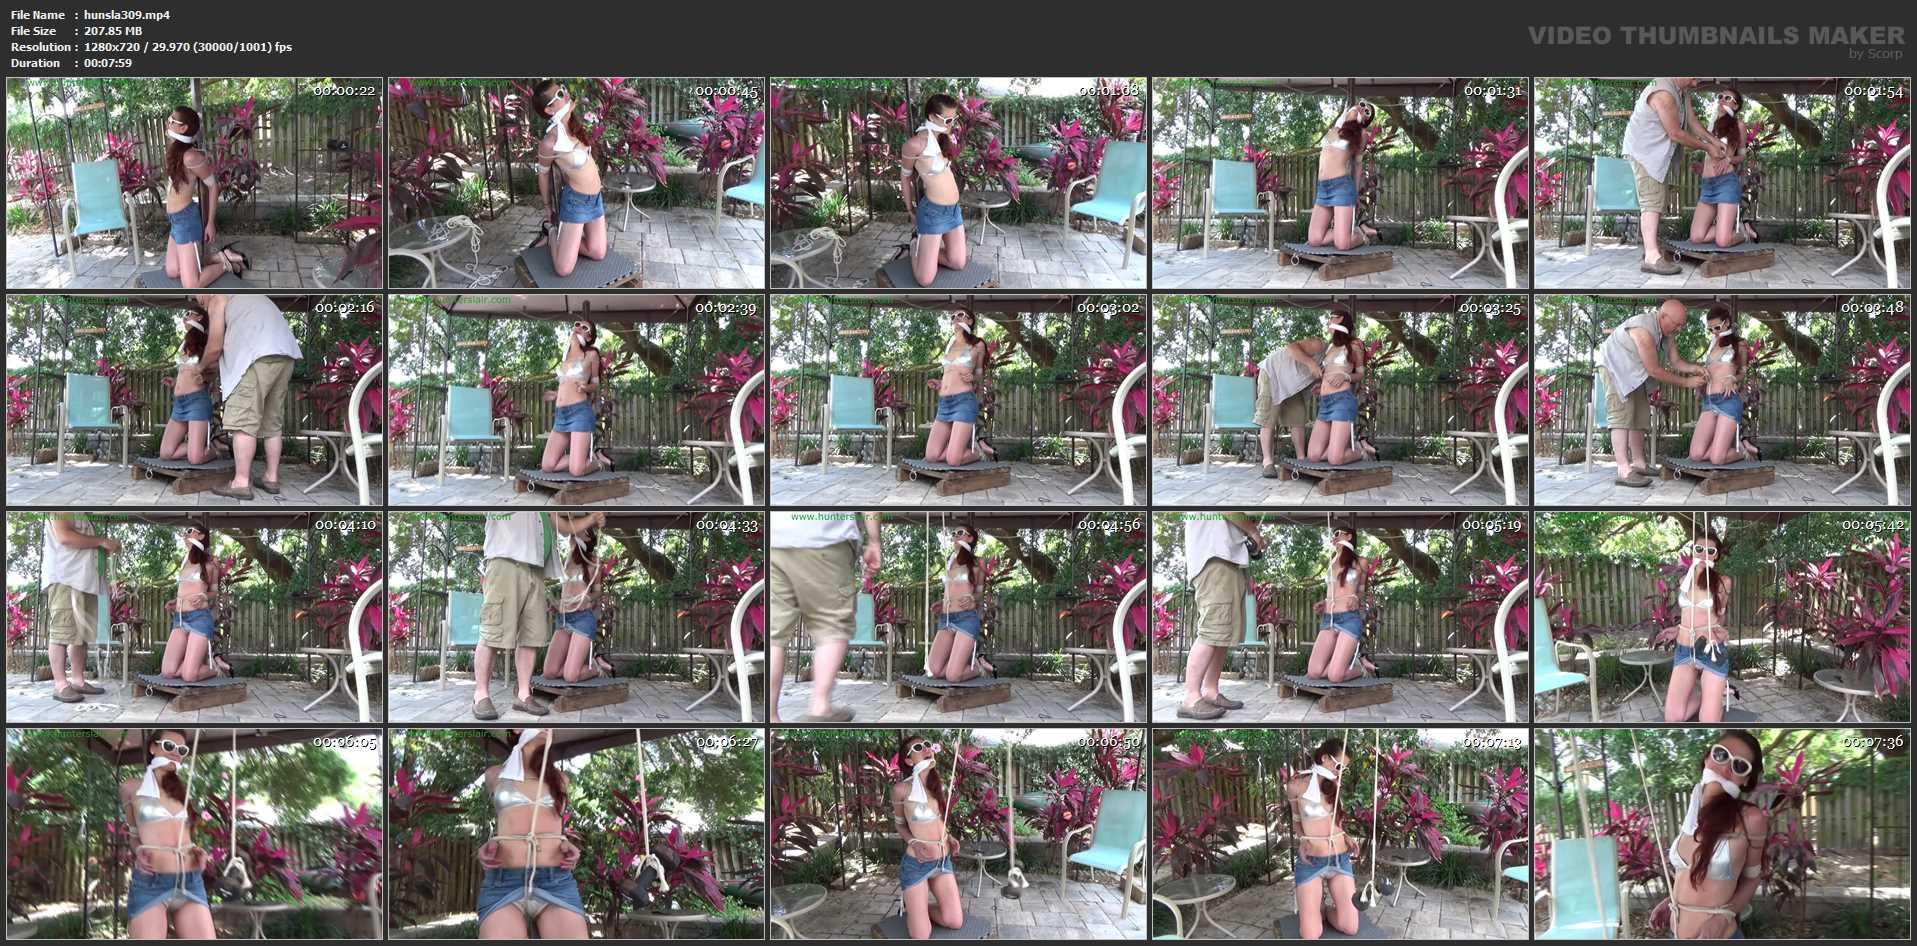 [HUNTERSLAIR] Cruel bondage predicament in the garden. Featuring: Ren Smolder [HD][720p][MP4]